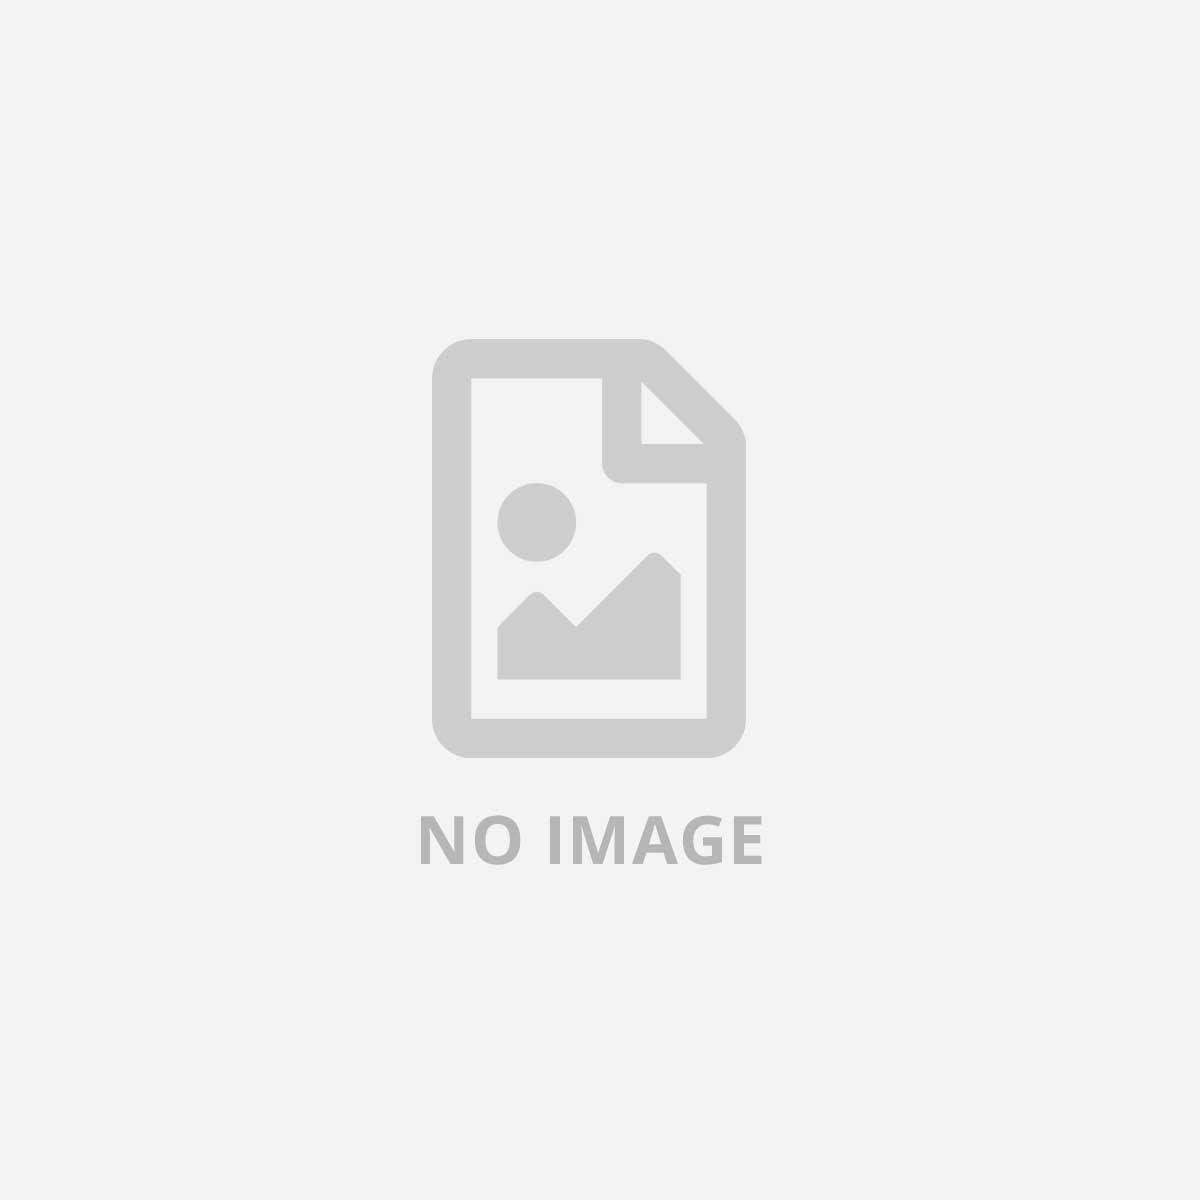 NETGEAR SW 24P 10/100/1000 MBPS + 2 SFP